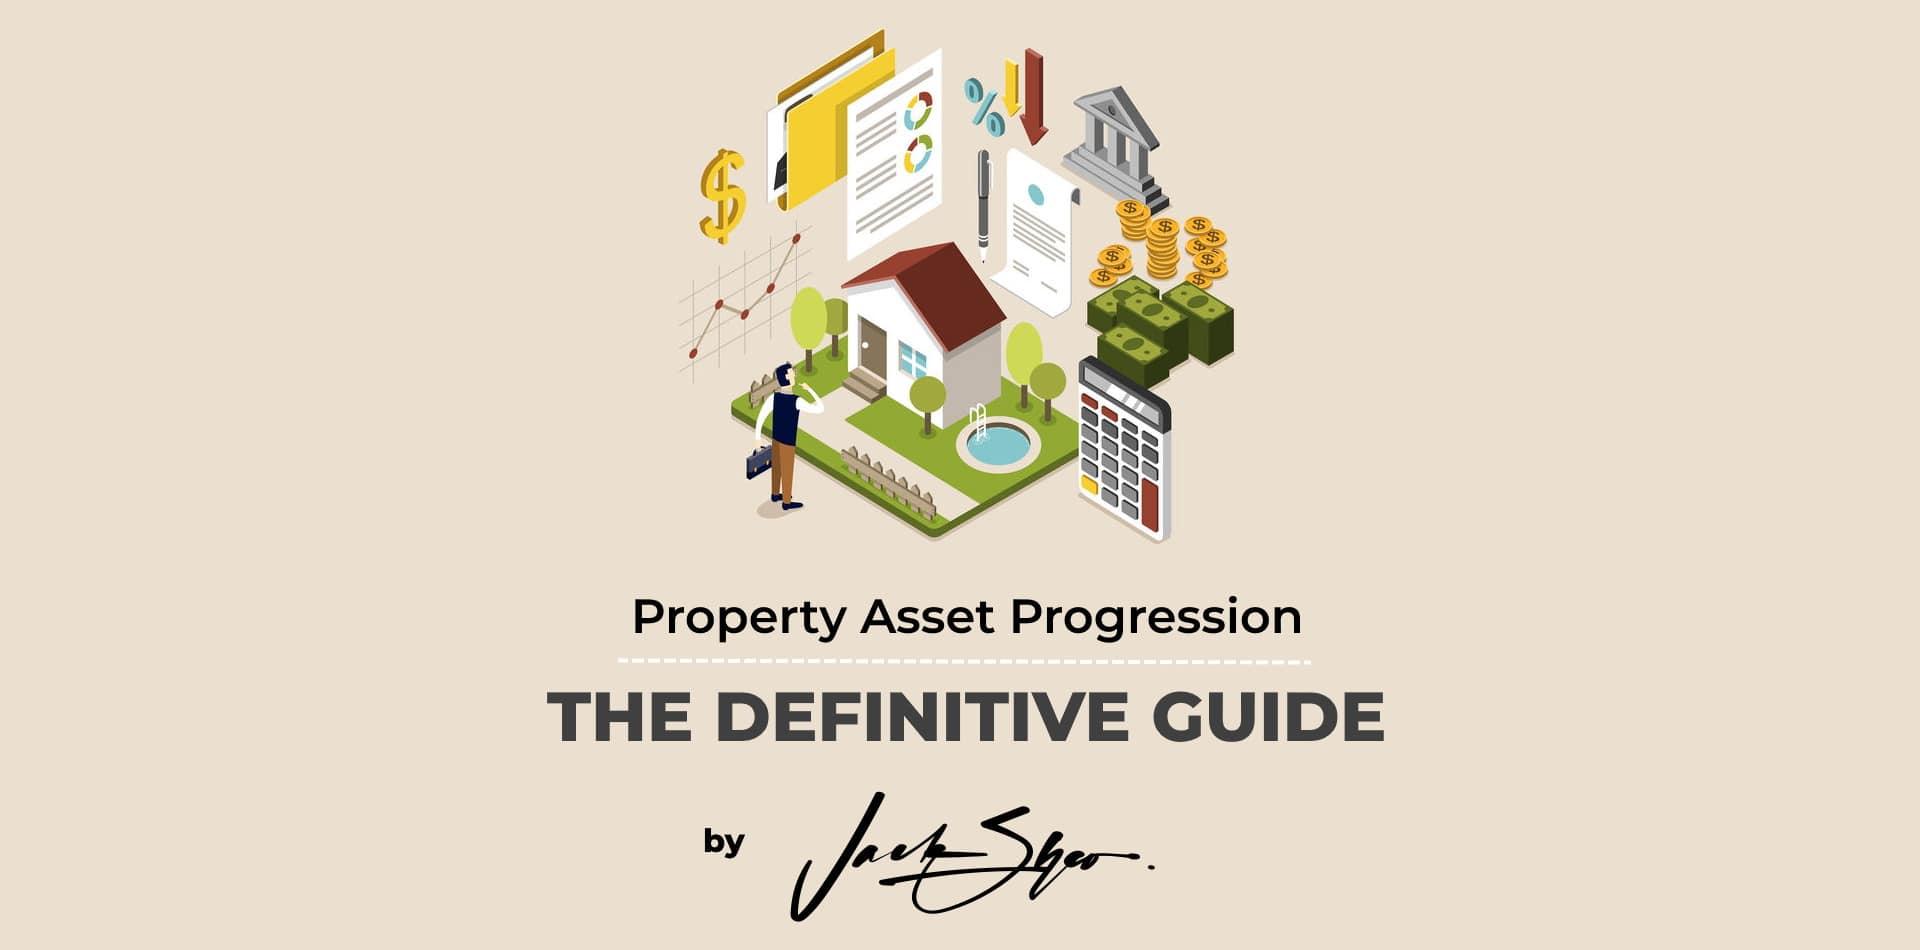 Property Asset Progression Plan - The Definitive Guide by Jack Sheo